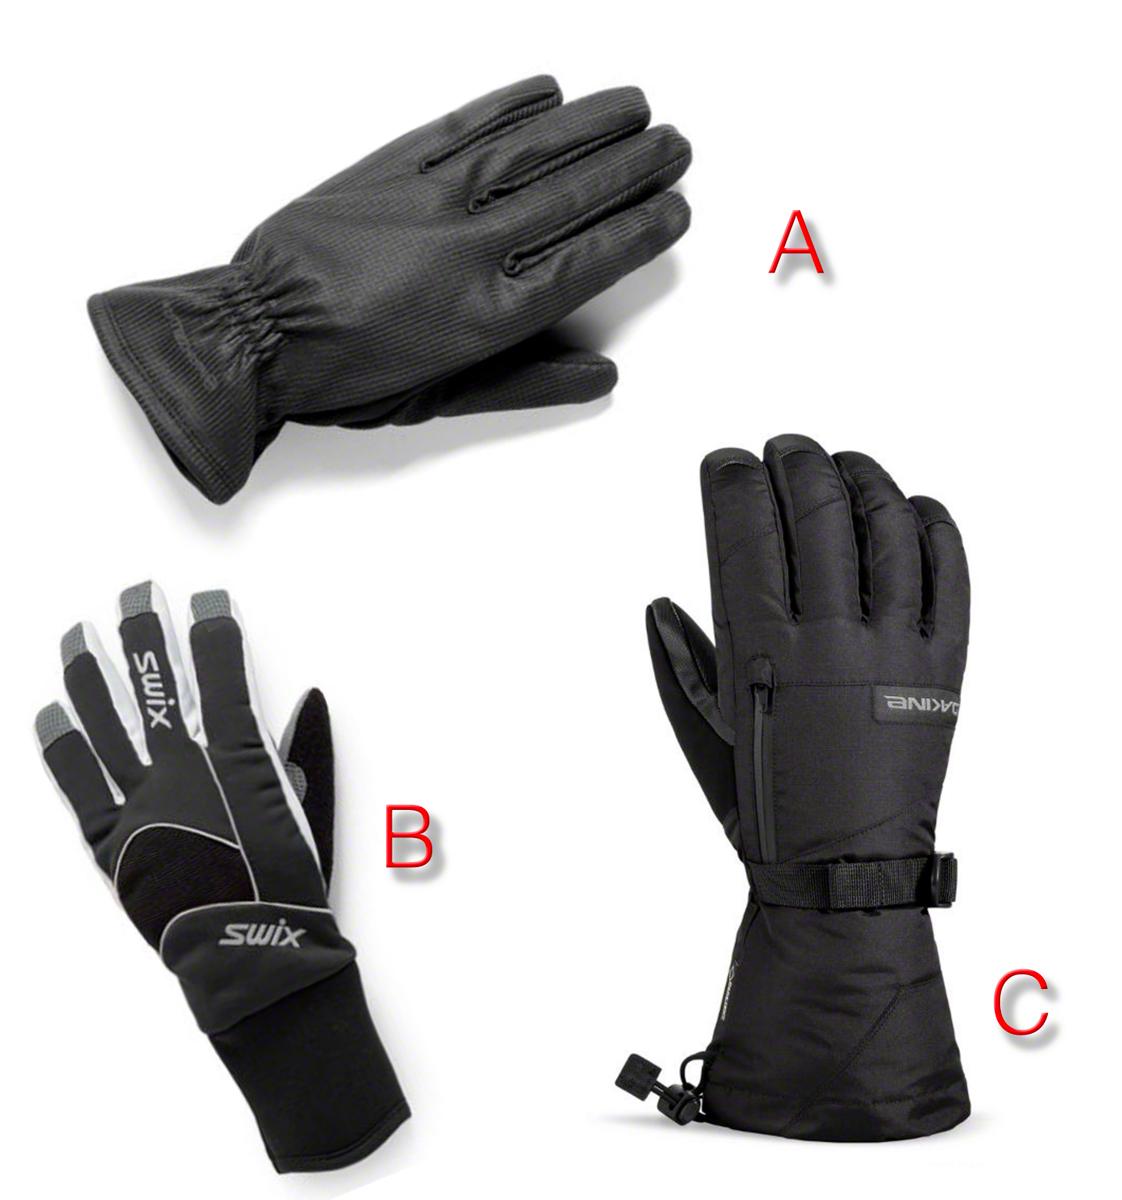 Gloves 2020 Edition